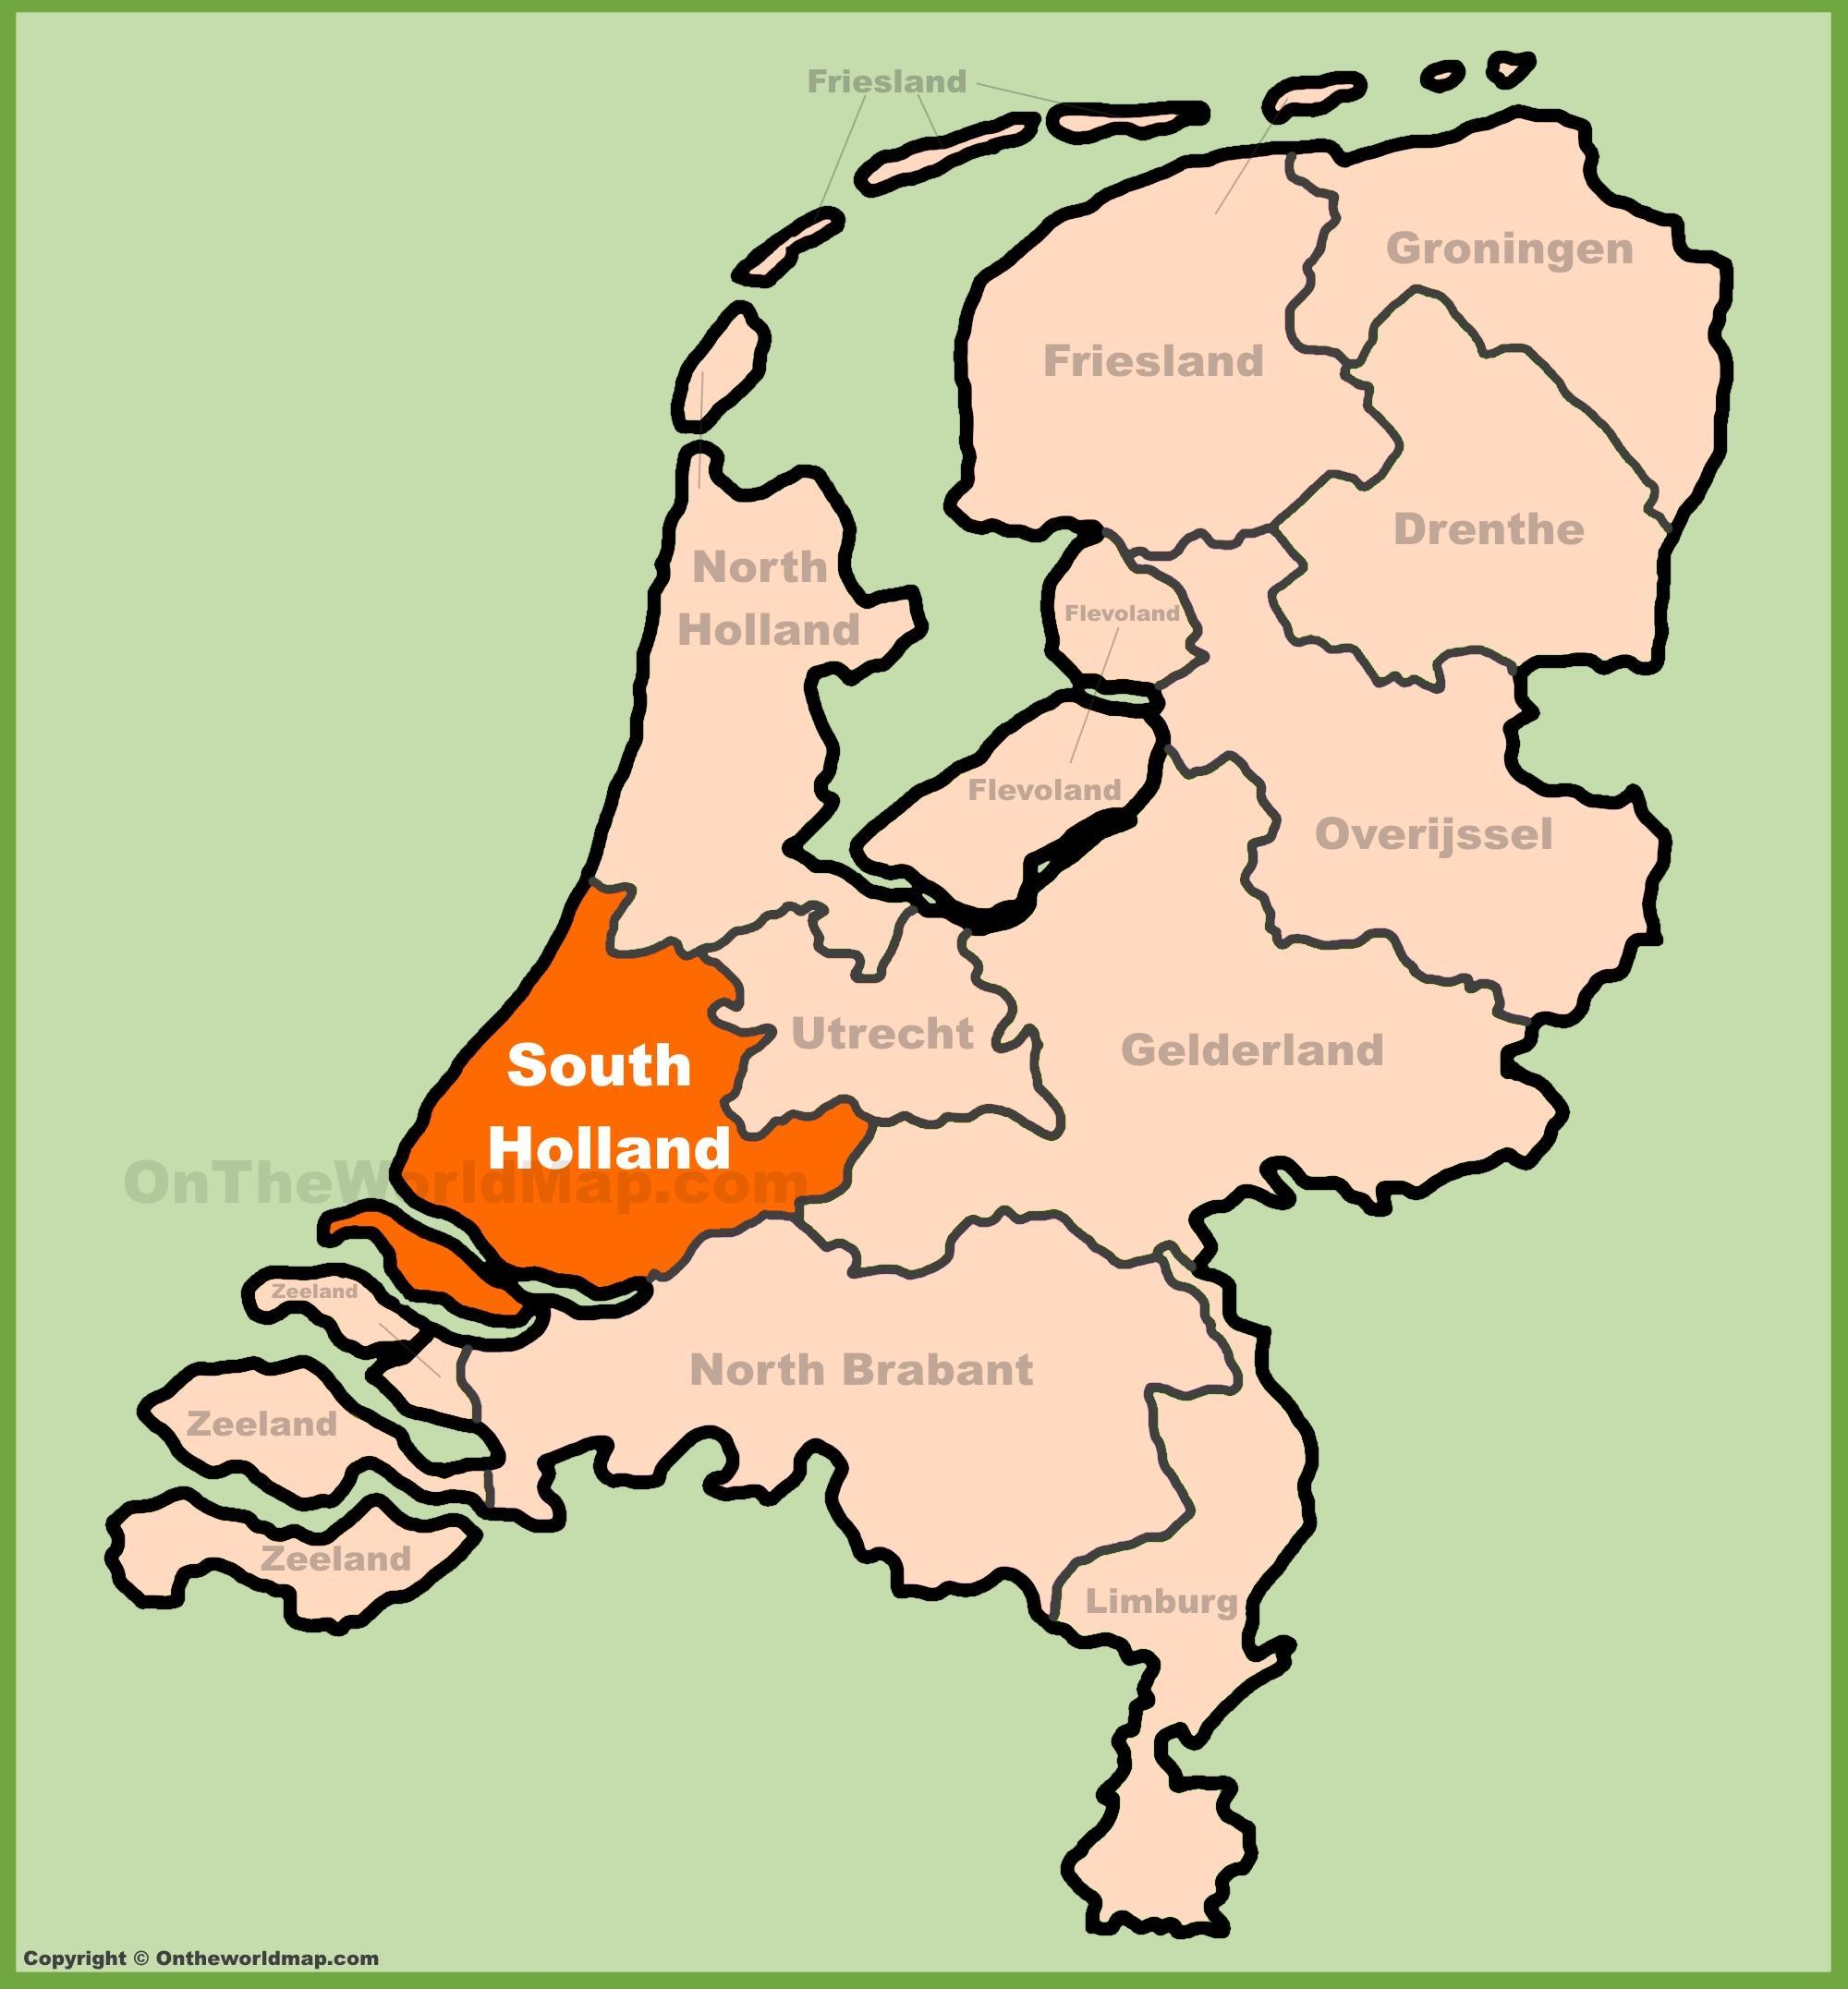 Europa Meridionale Cartina.Mappa Dell Olanda Meridionale Mappa Di South Holland Paesi Bassi Europa Occidentale Europa